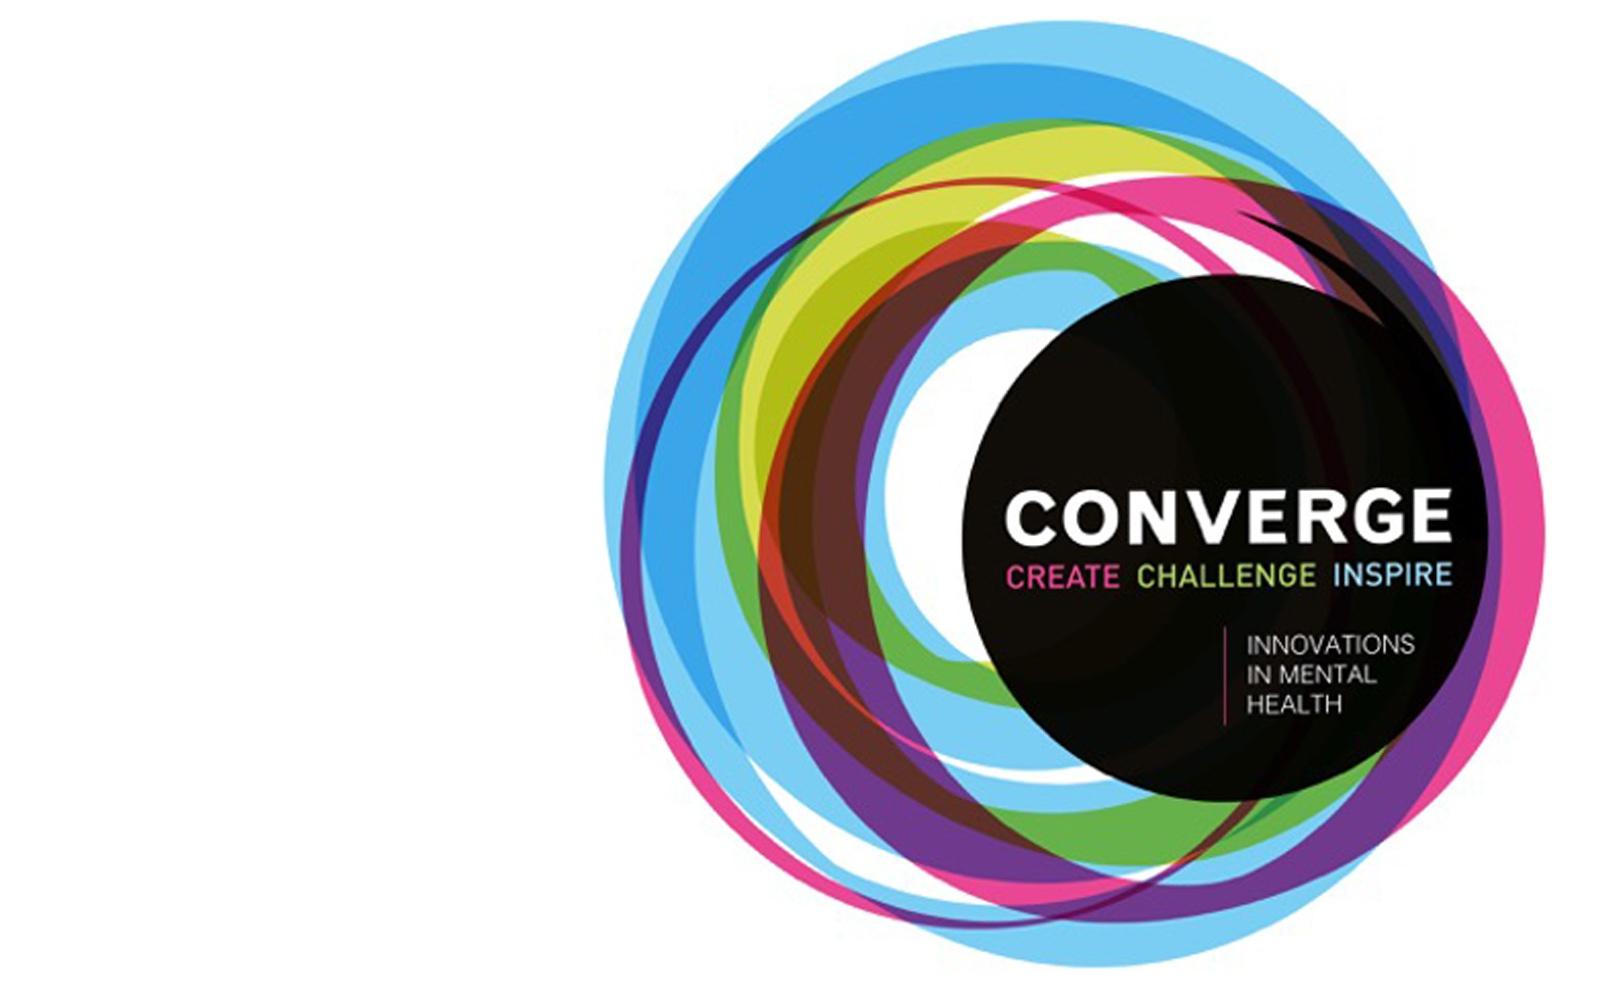 Converge logo - create challenge inspire